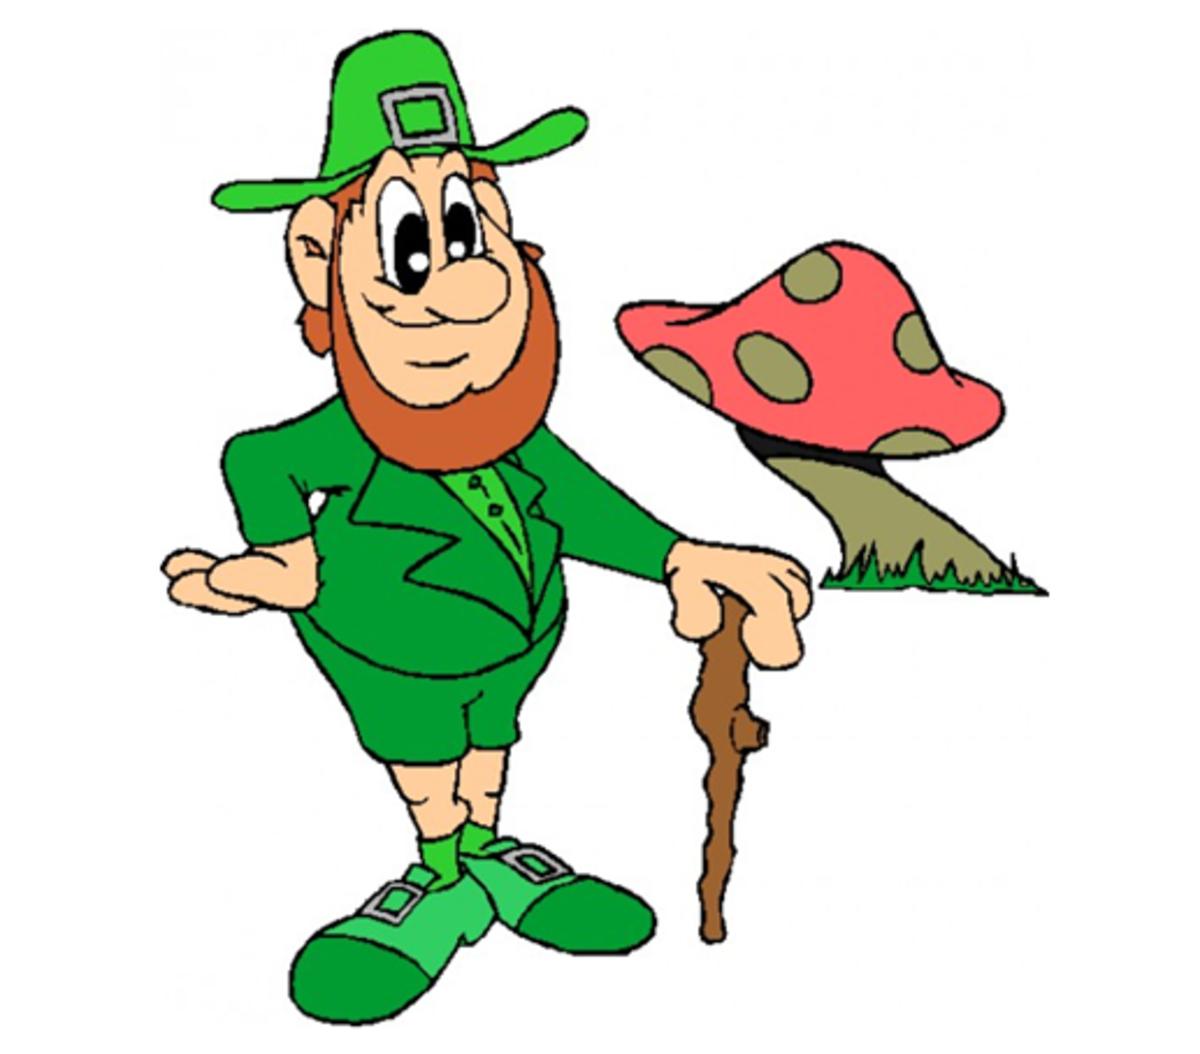 Leprechaun Standing Next to a Mushroom